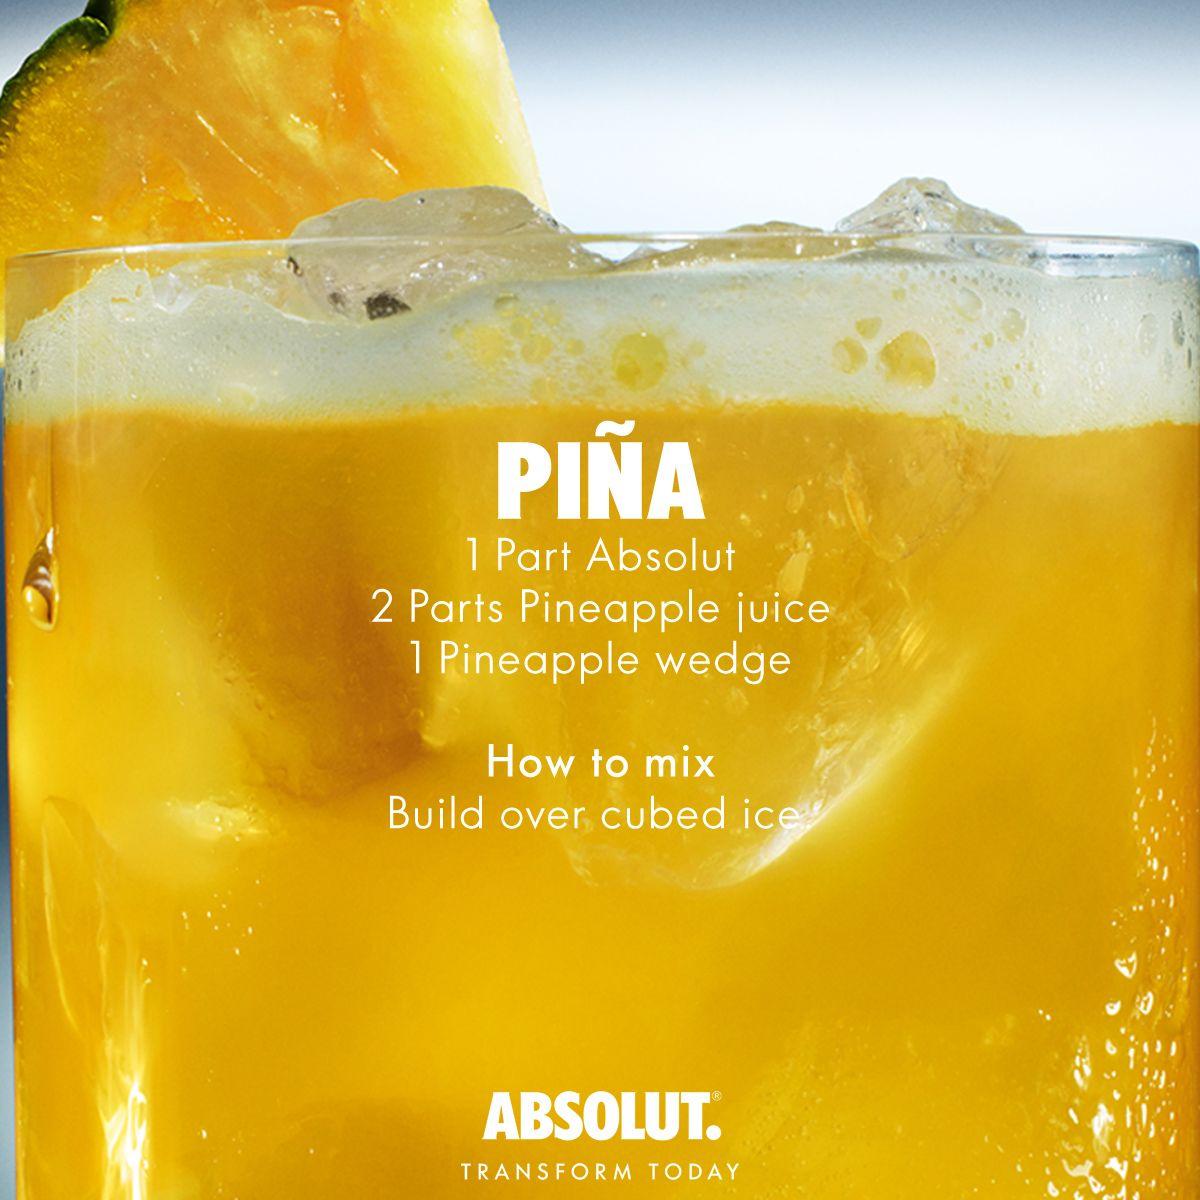 Cocktail Recipes. Pina: 1 Part Absolut Vodka; 2 Parts